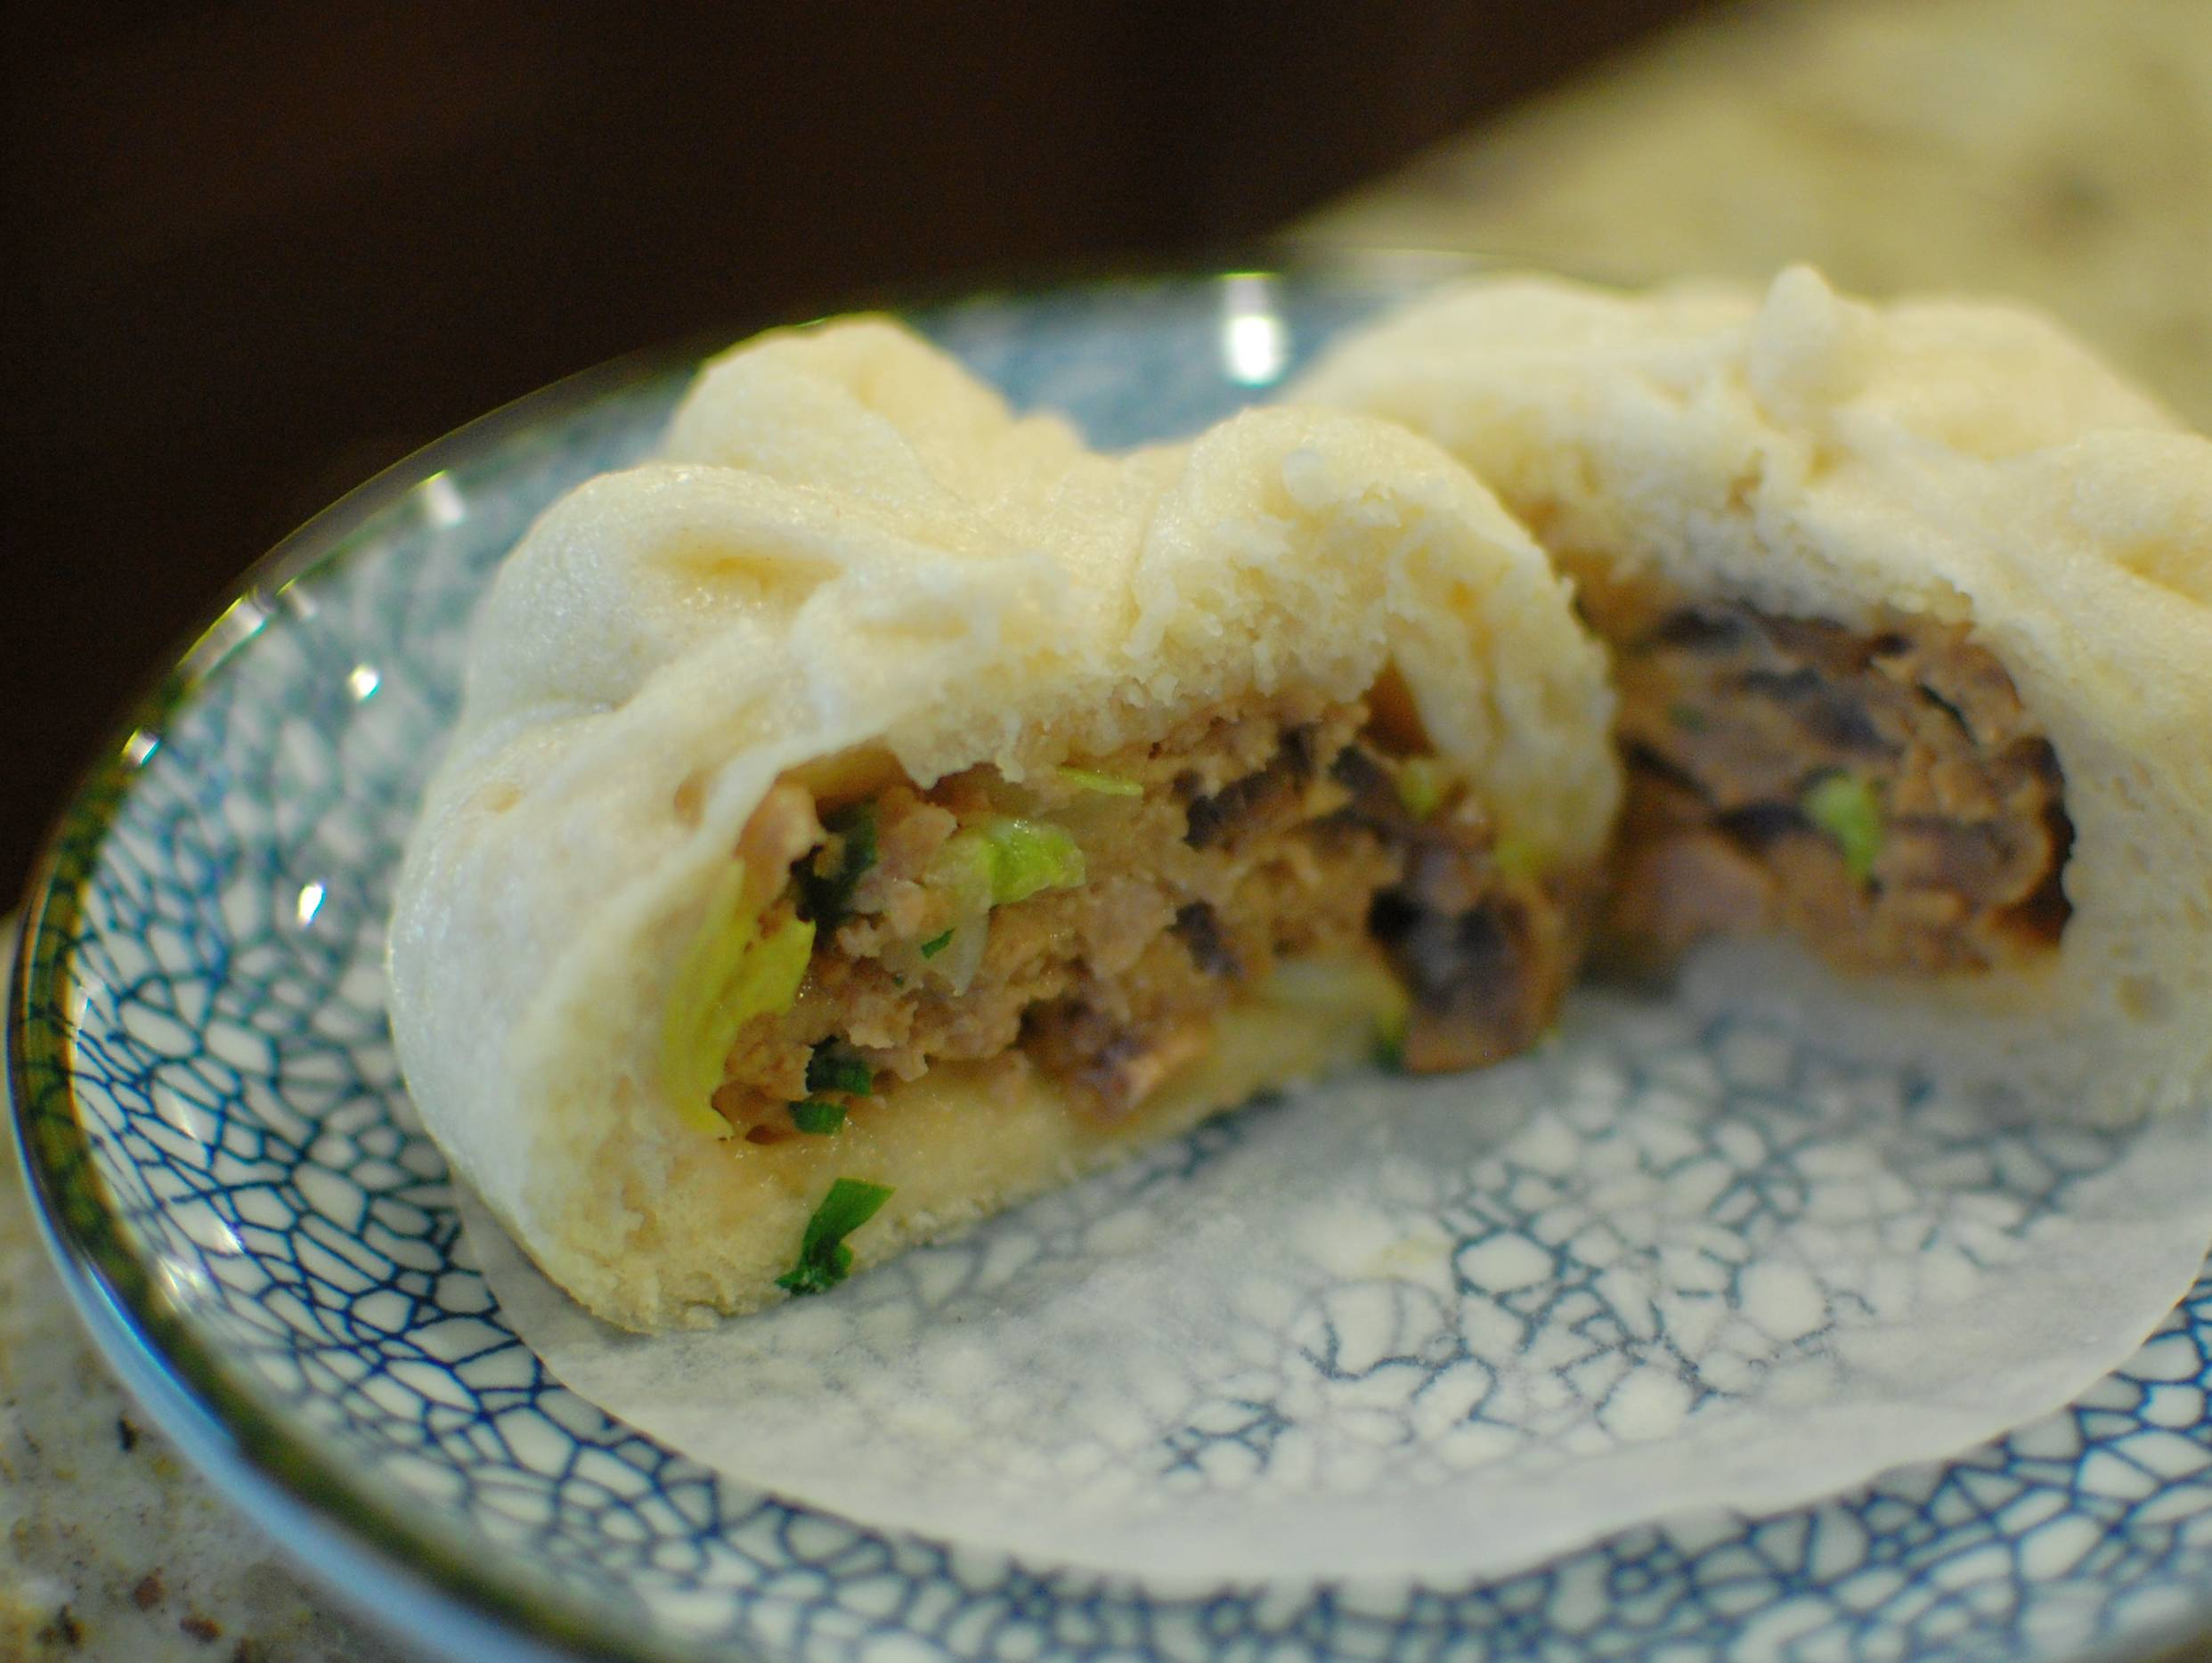 baozi i love steamed pork buns baozi chinese steamed buns chinese food ...